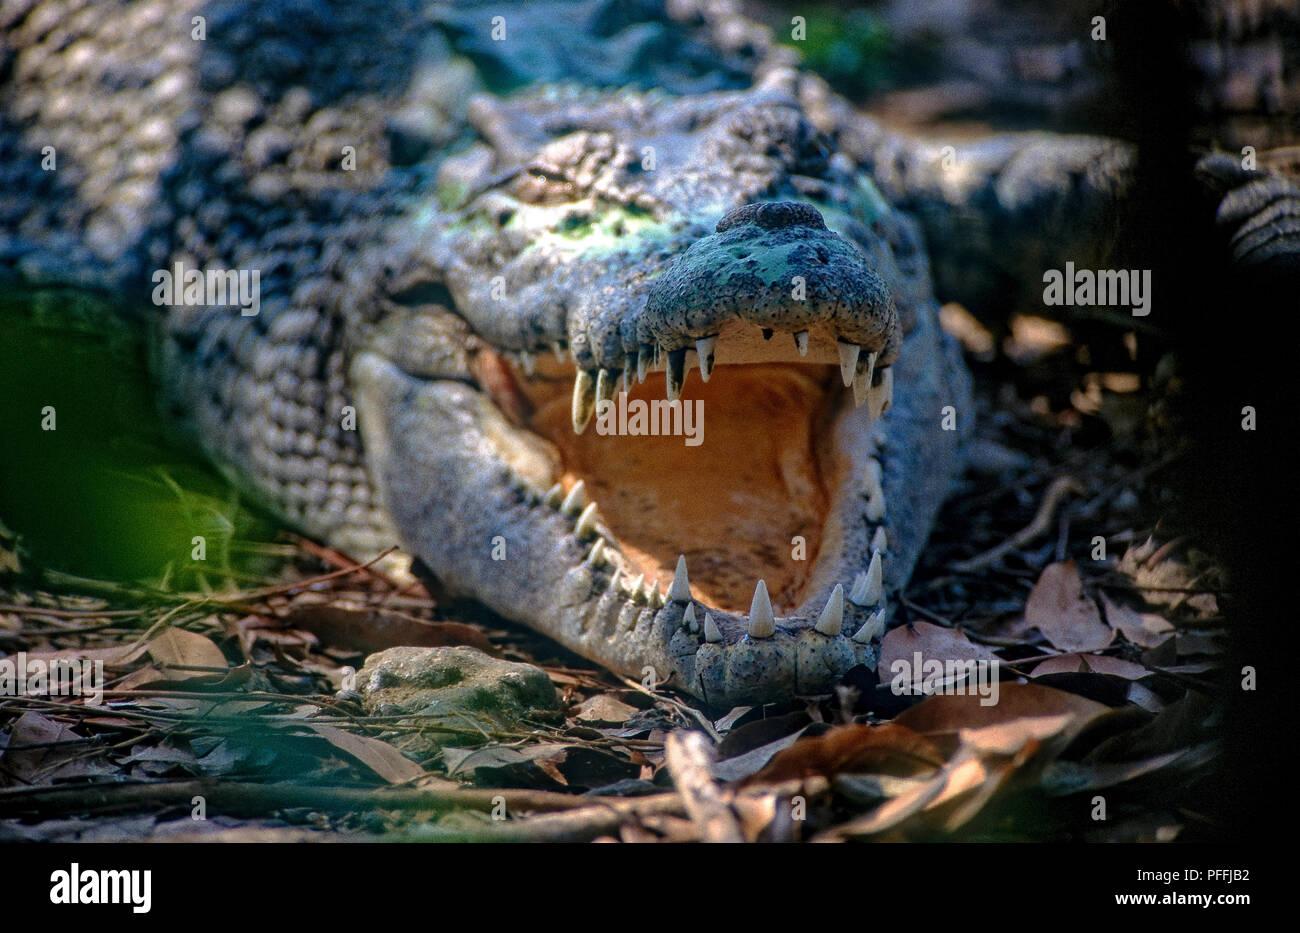 Australia Nothern Territory Darwin  Kakadu National Park - Crocodile Stock Photo